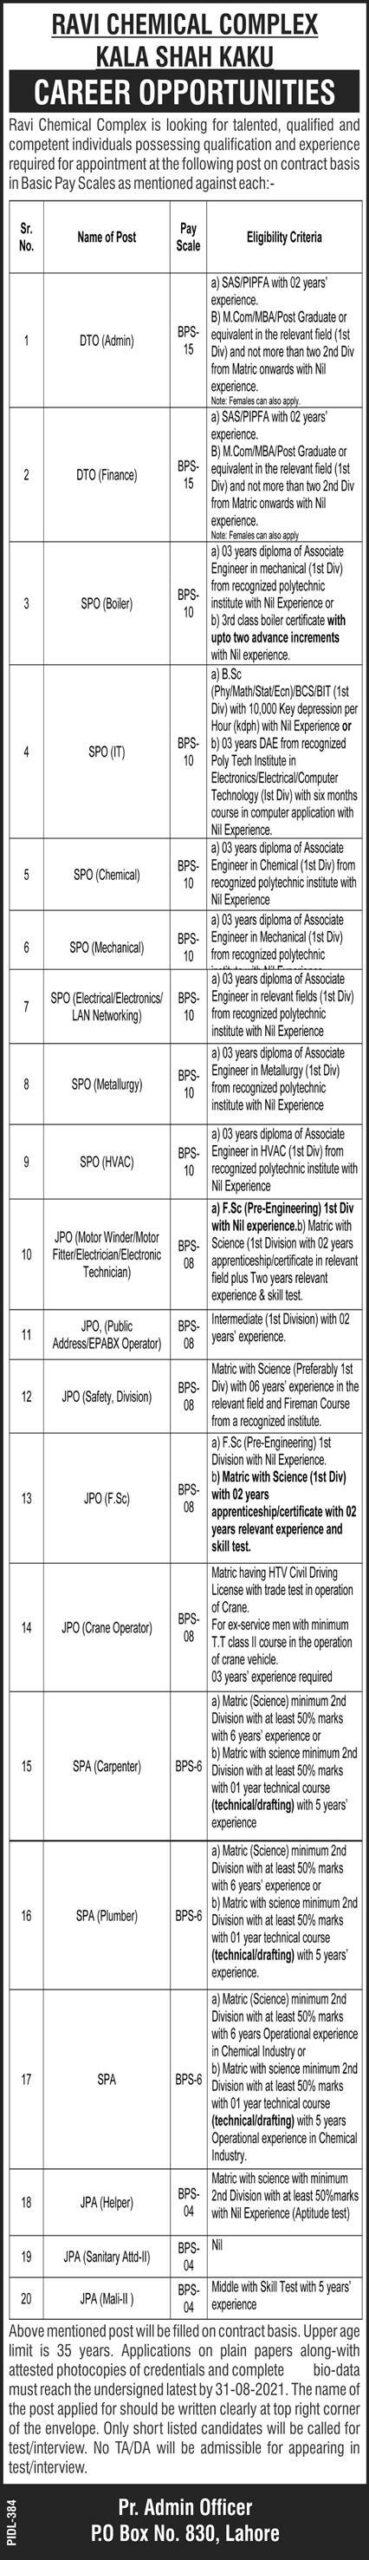 Ravi Chemical Complex Kala Shah Kaku Jobs August 2021